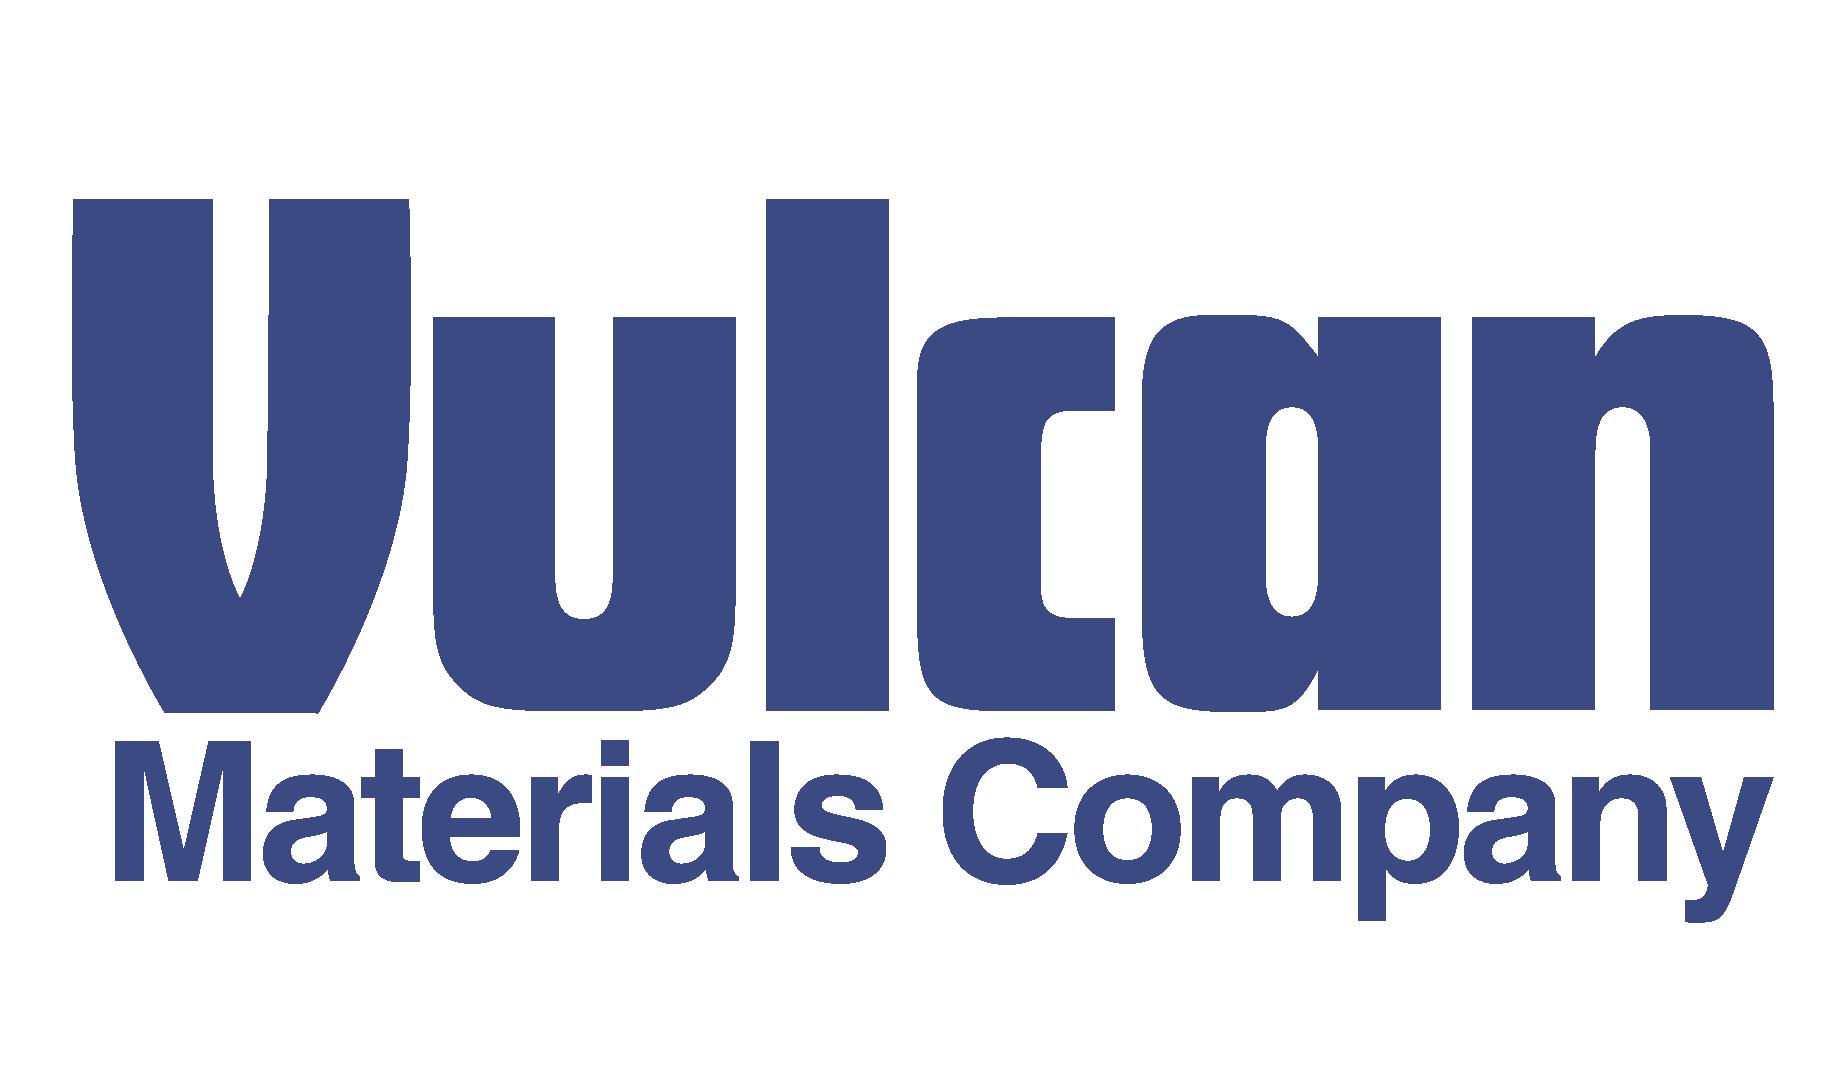 Logo for Vulcan Materials Company